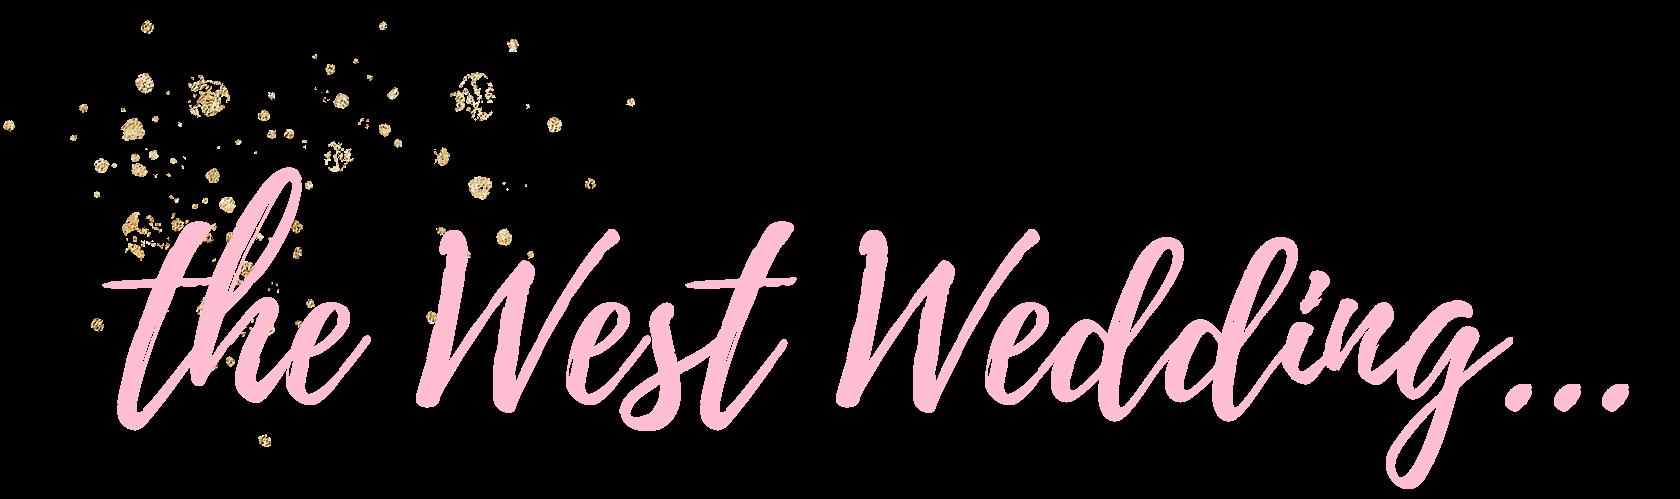 west wedding.png